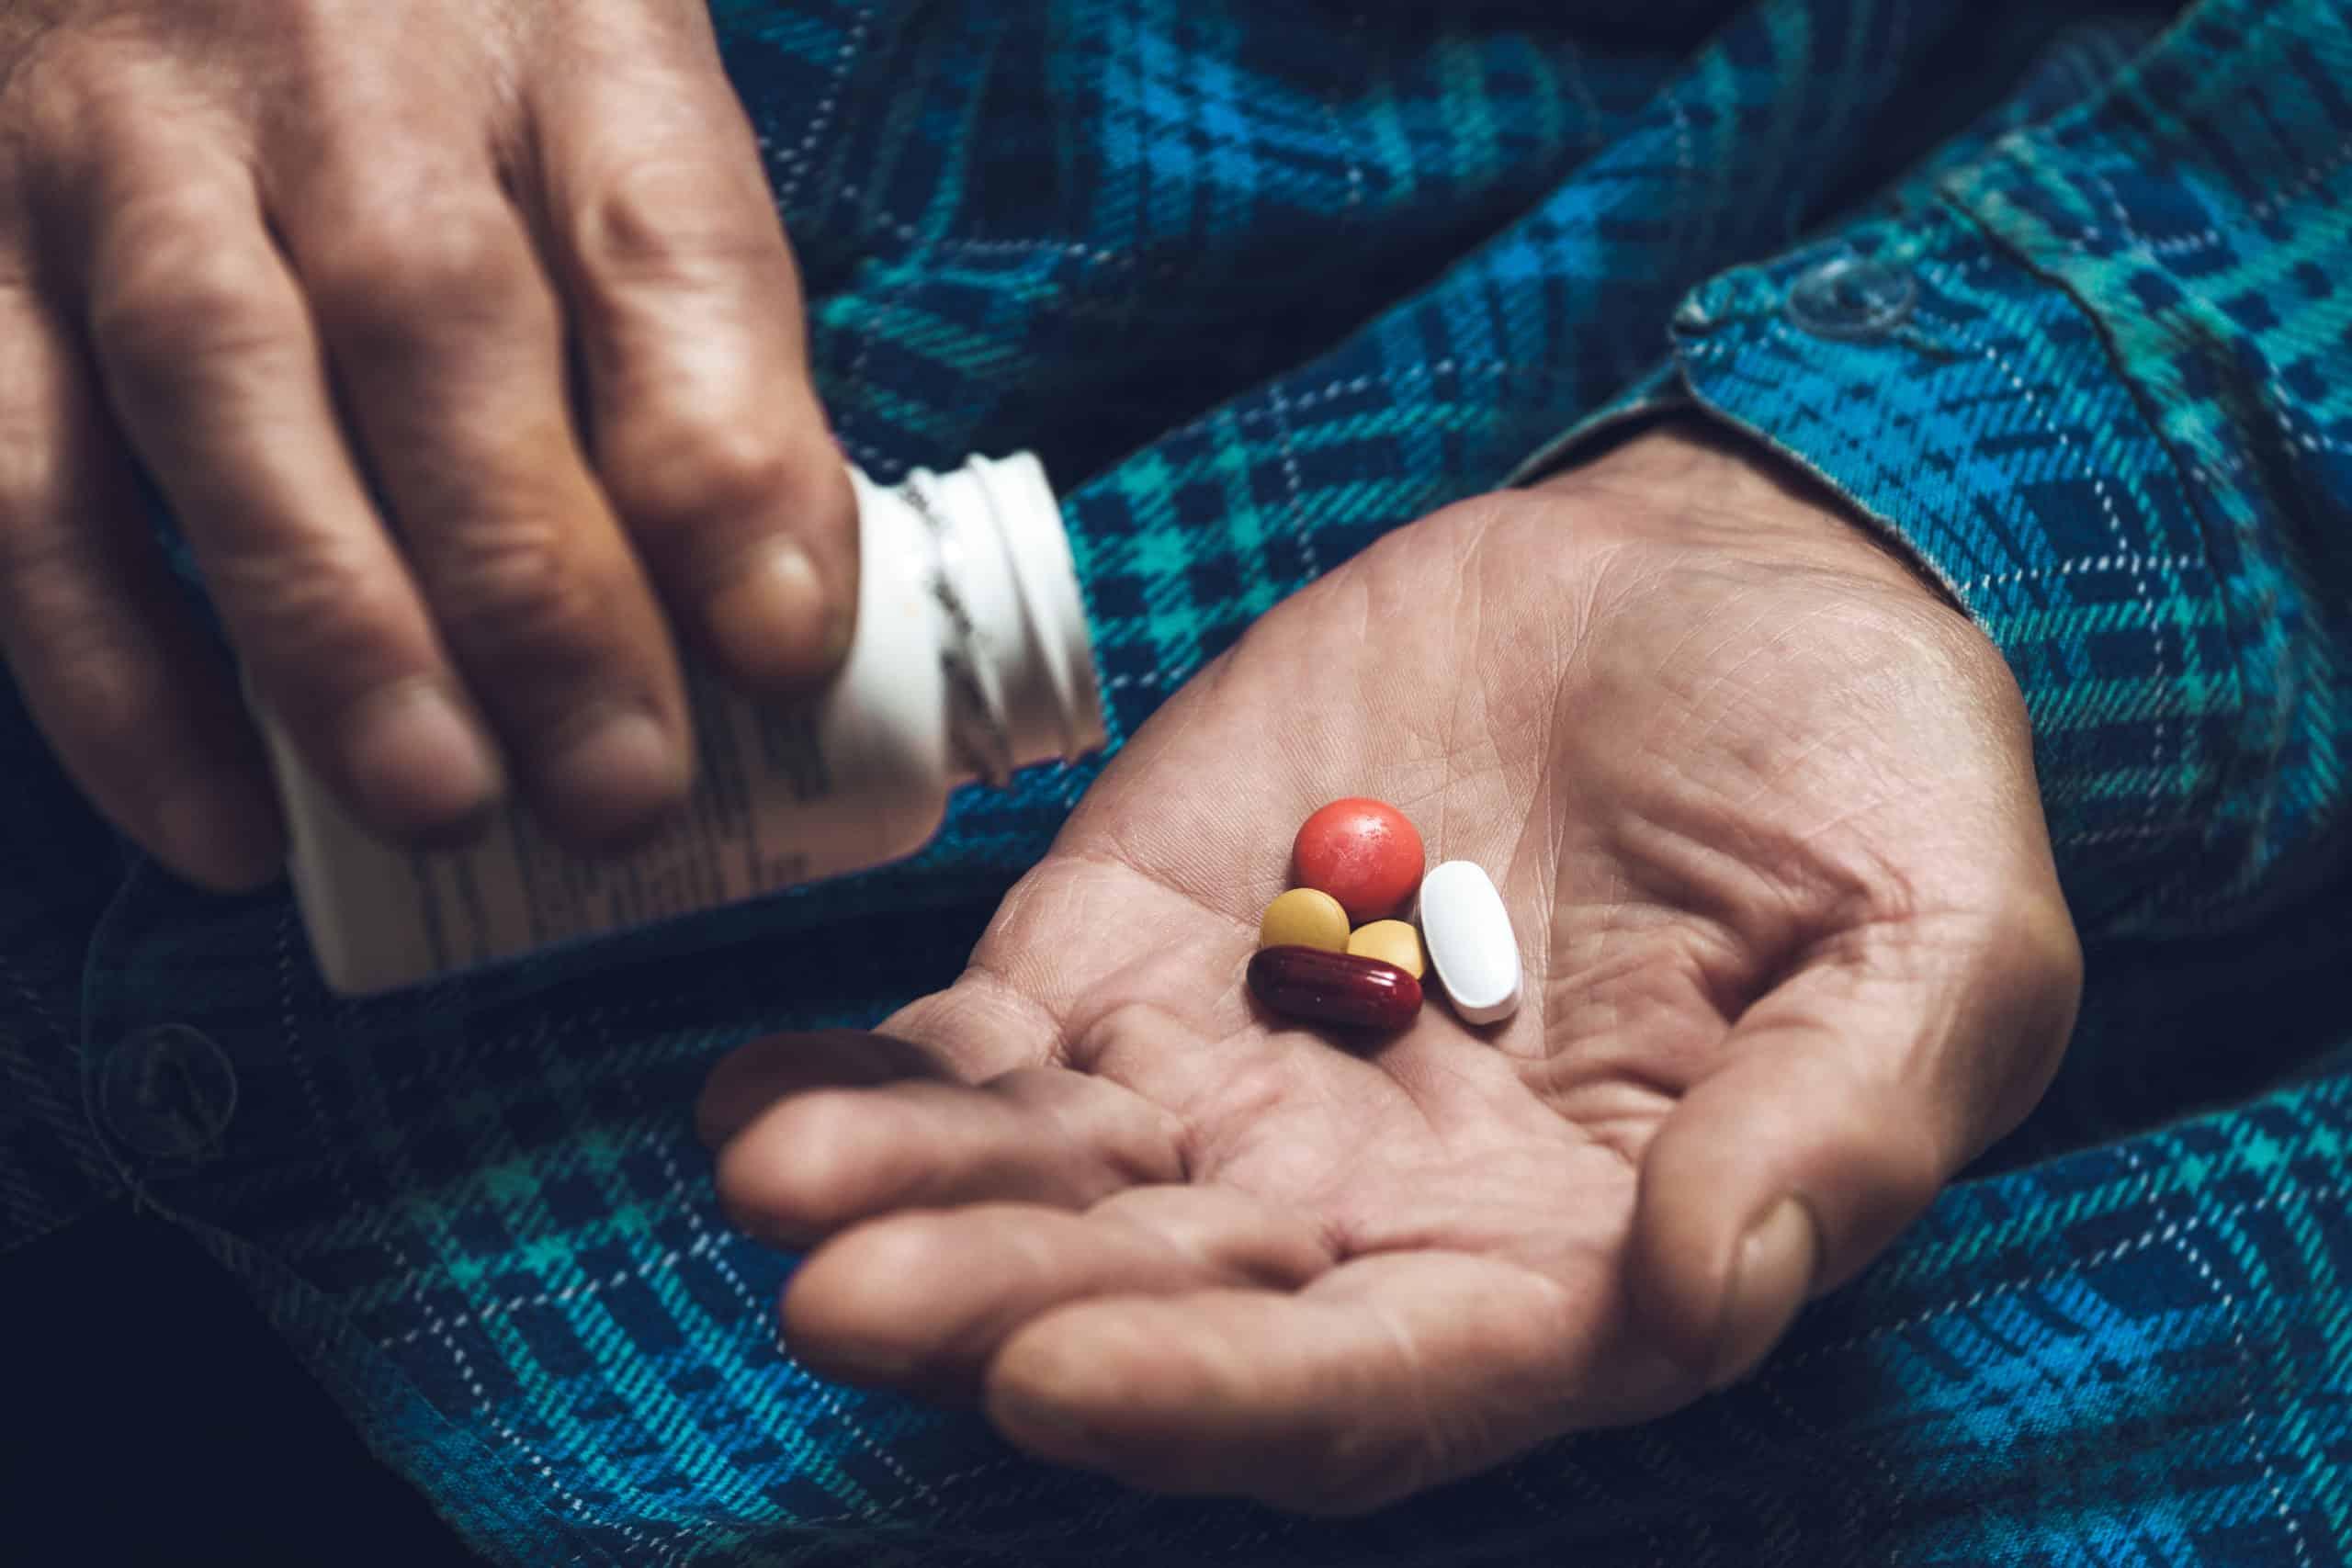 pastillero semanal de 3 tomas